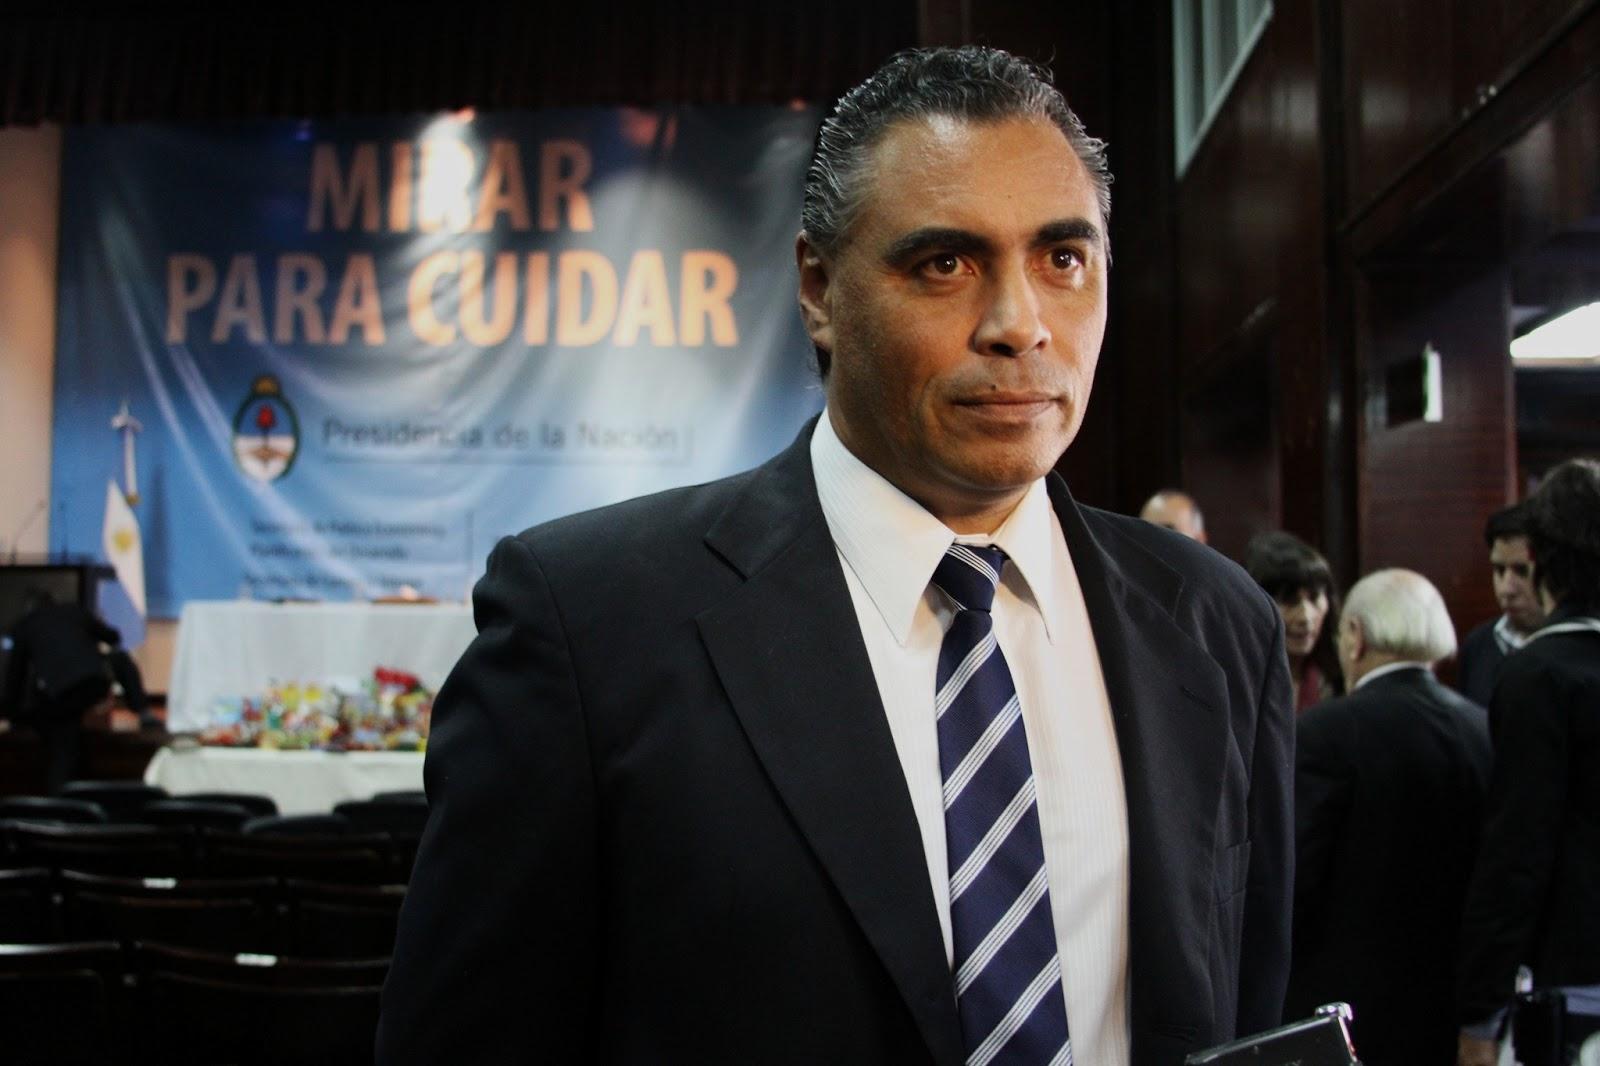 Prensa Municipalidad Jos C Paz Mirar Para Cuidar